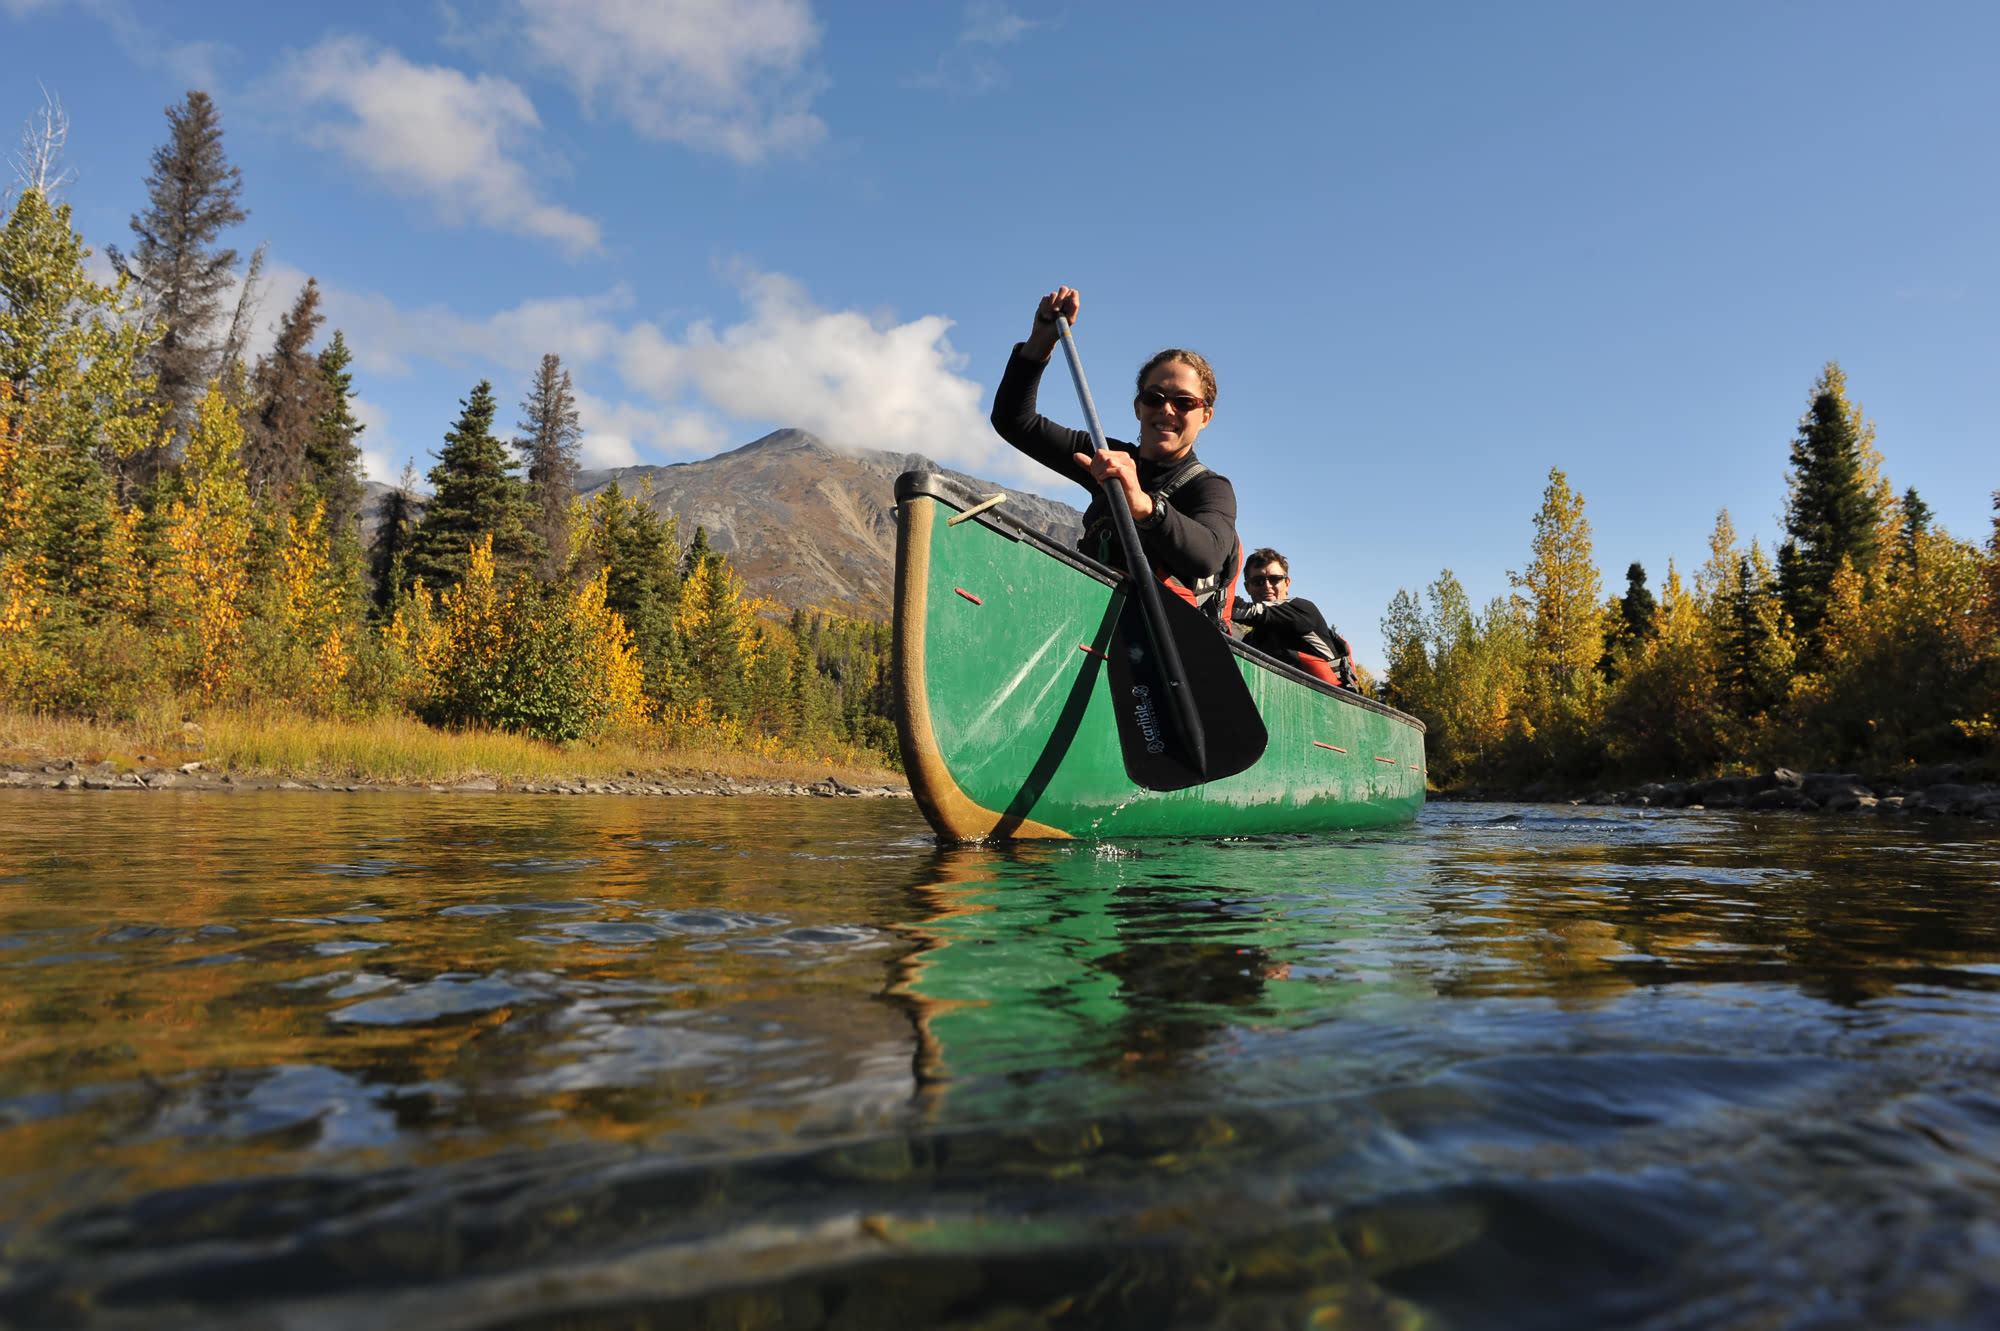 Canoe Yukon adventures